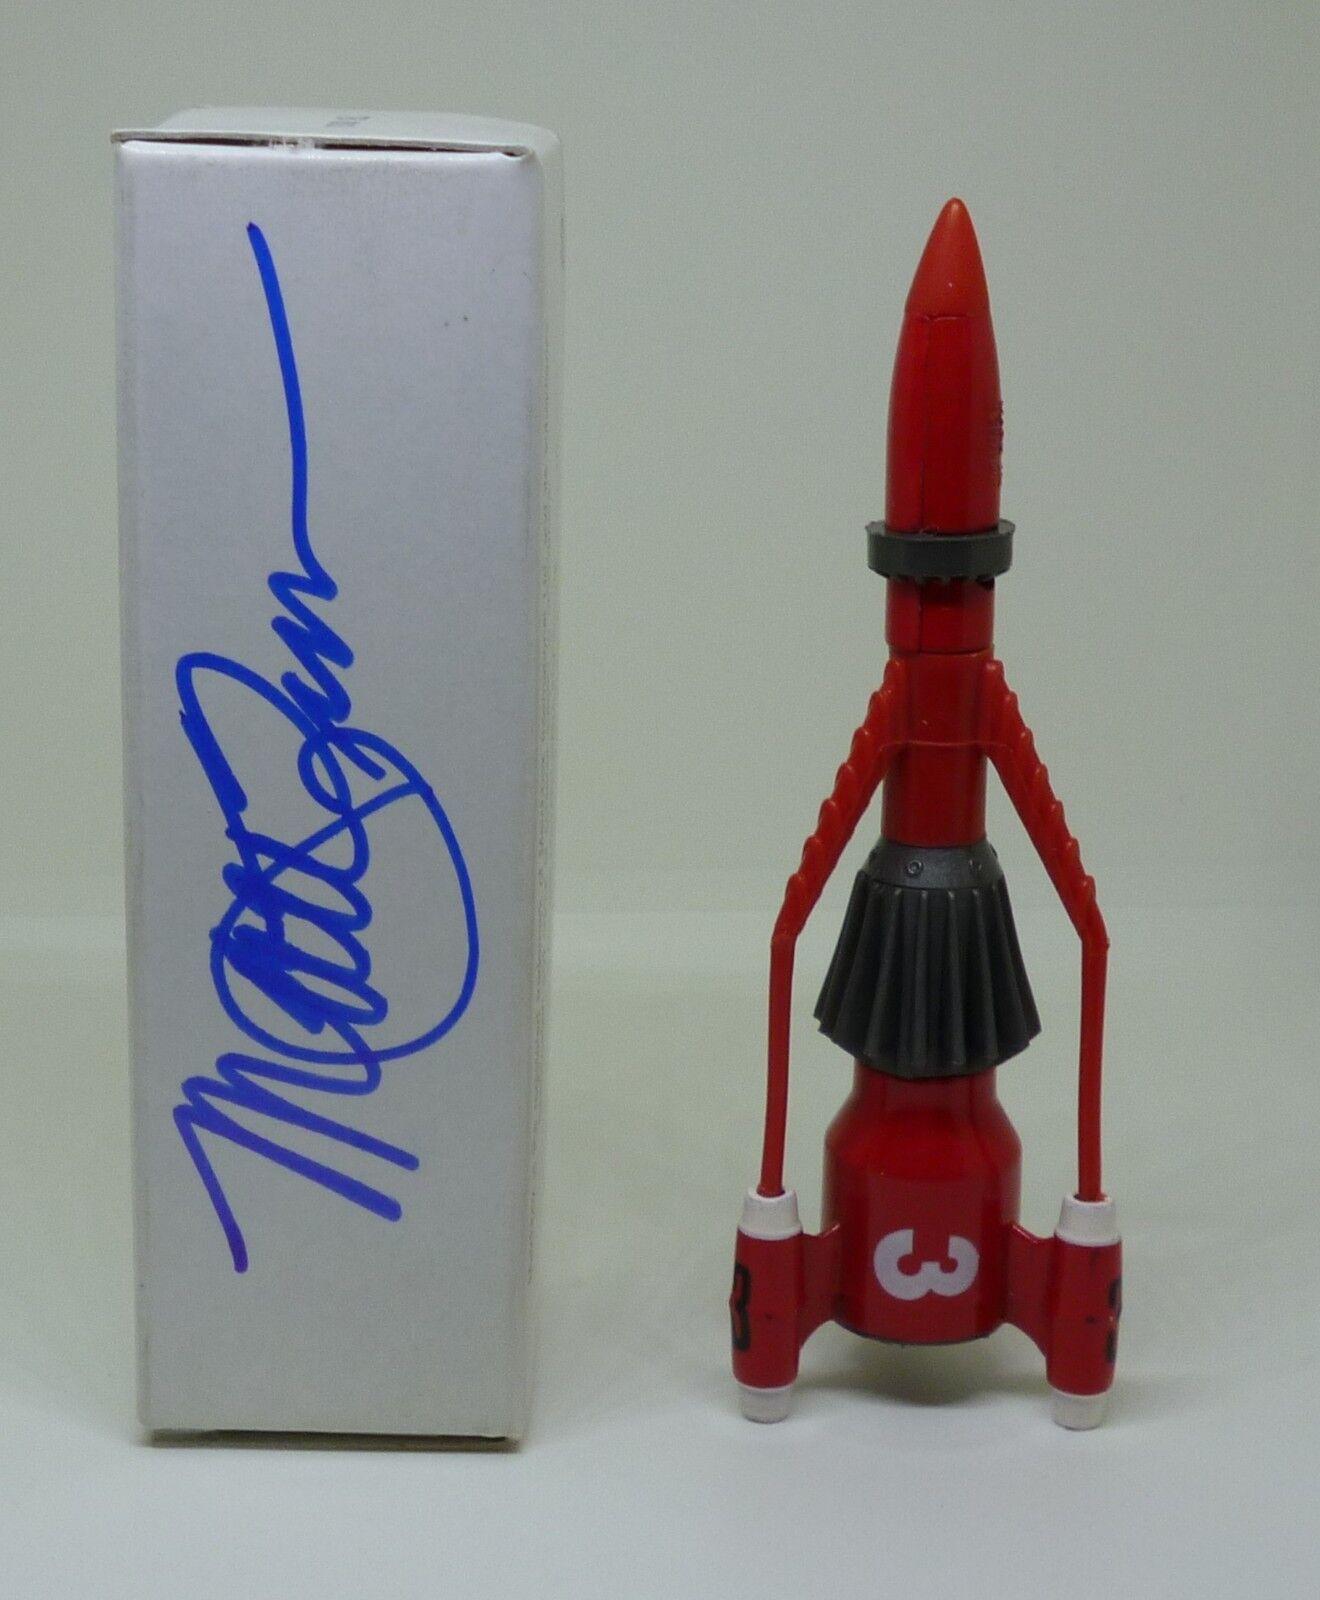 Matchbox Thunderbirds Thunderbird 3 Signed By Matt Zimmerman With Exact Proof